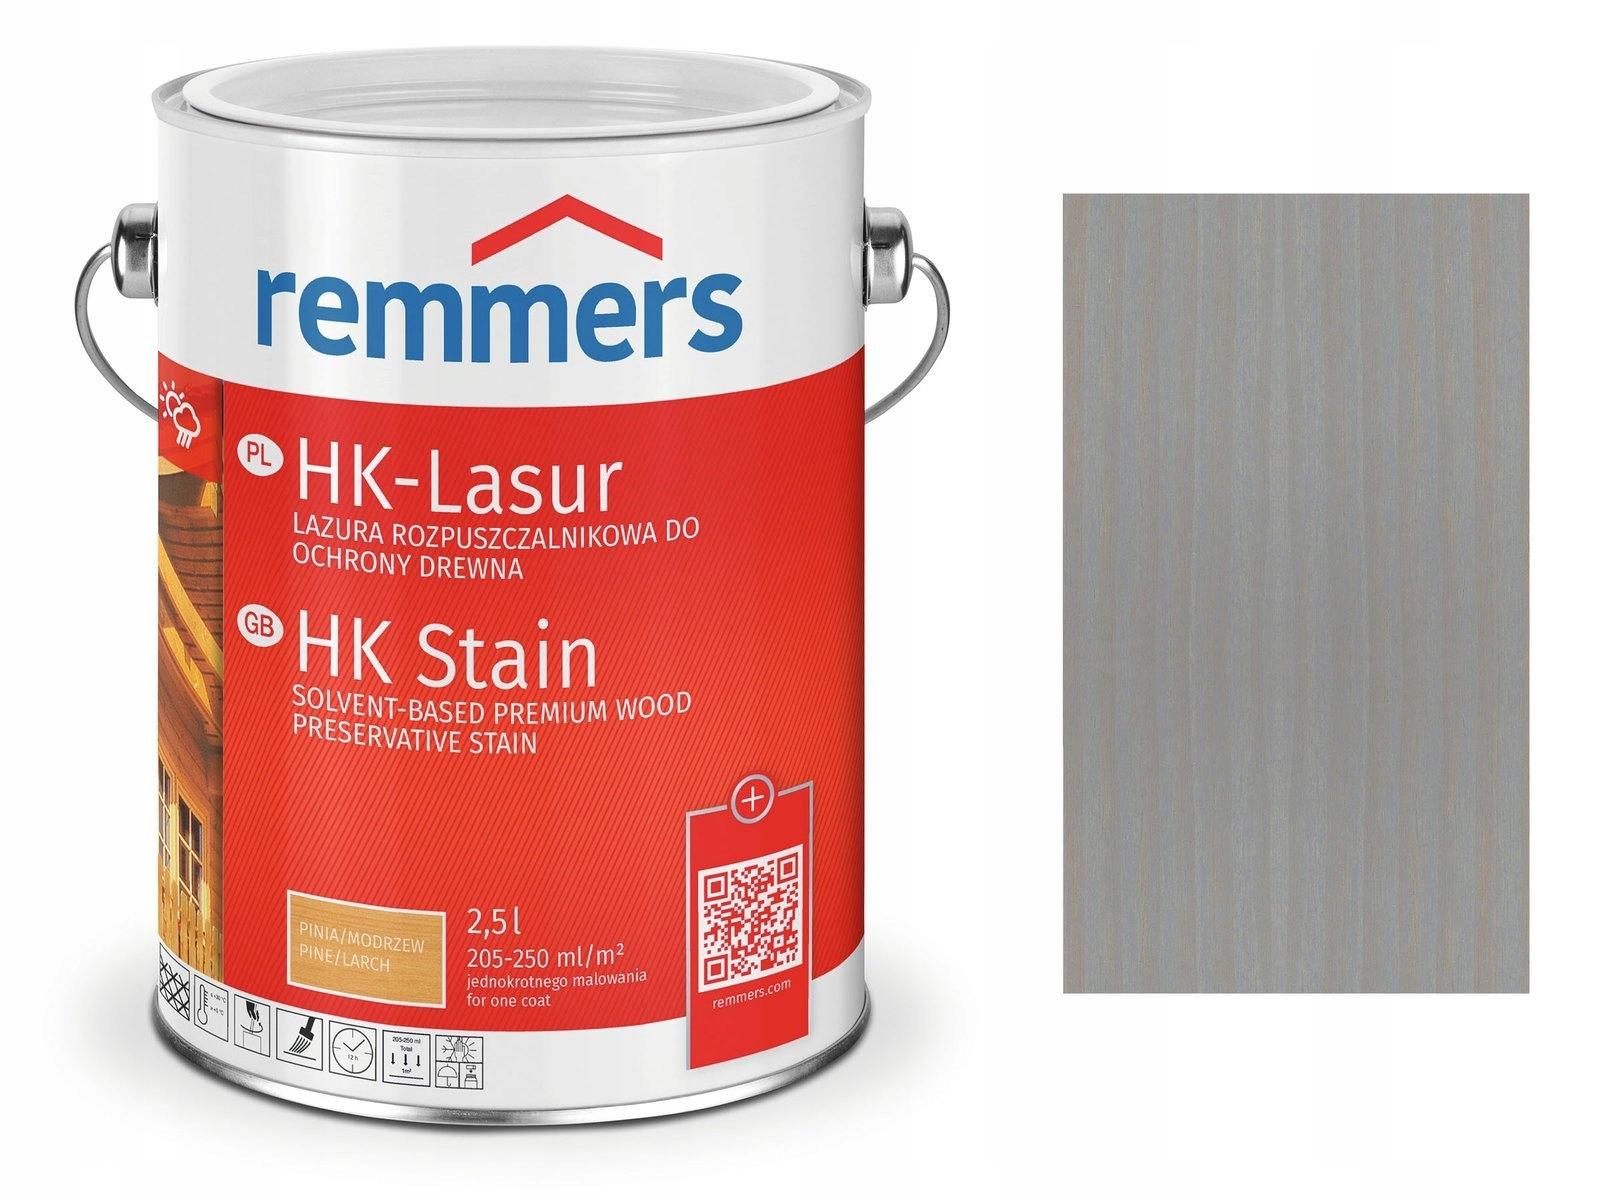 Remmers HK-Lasur-пропитка для дерева 0,75 Л СЕРЫЙ